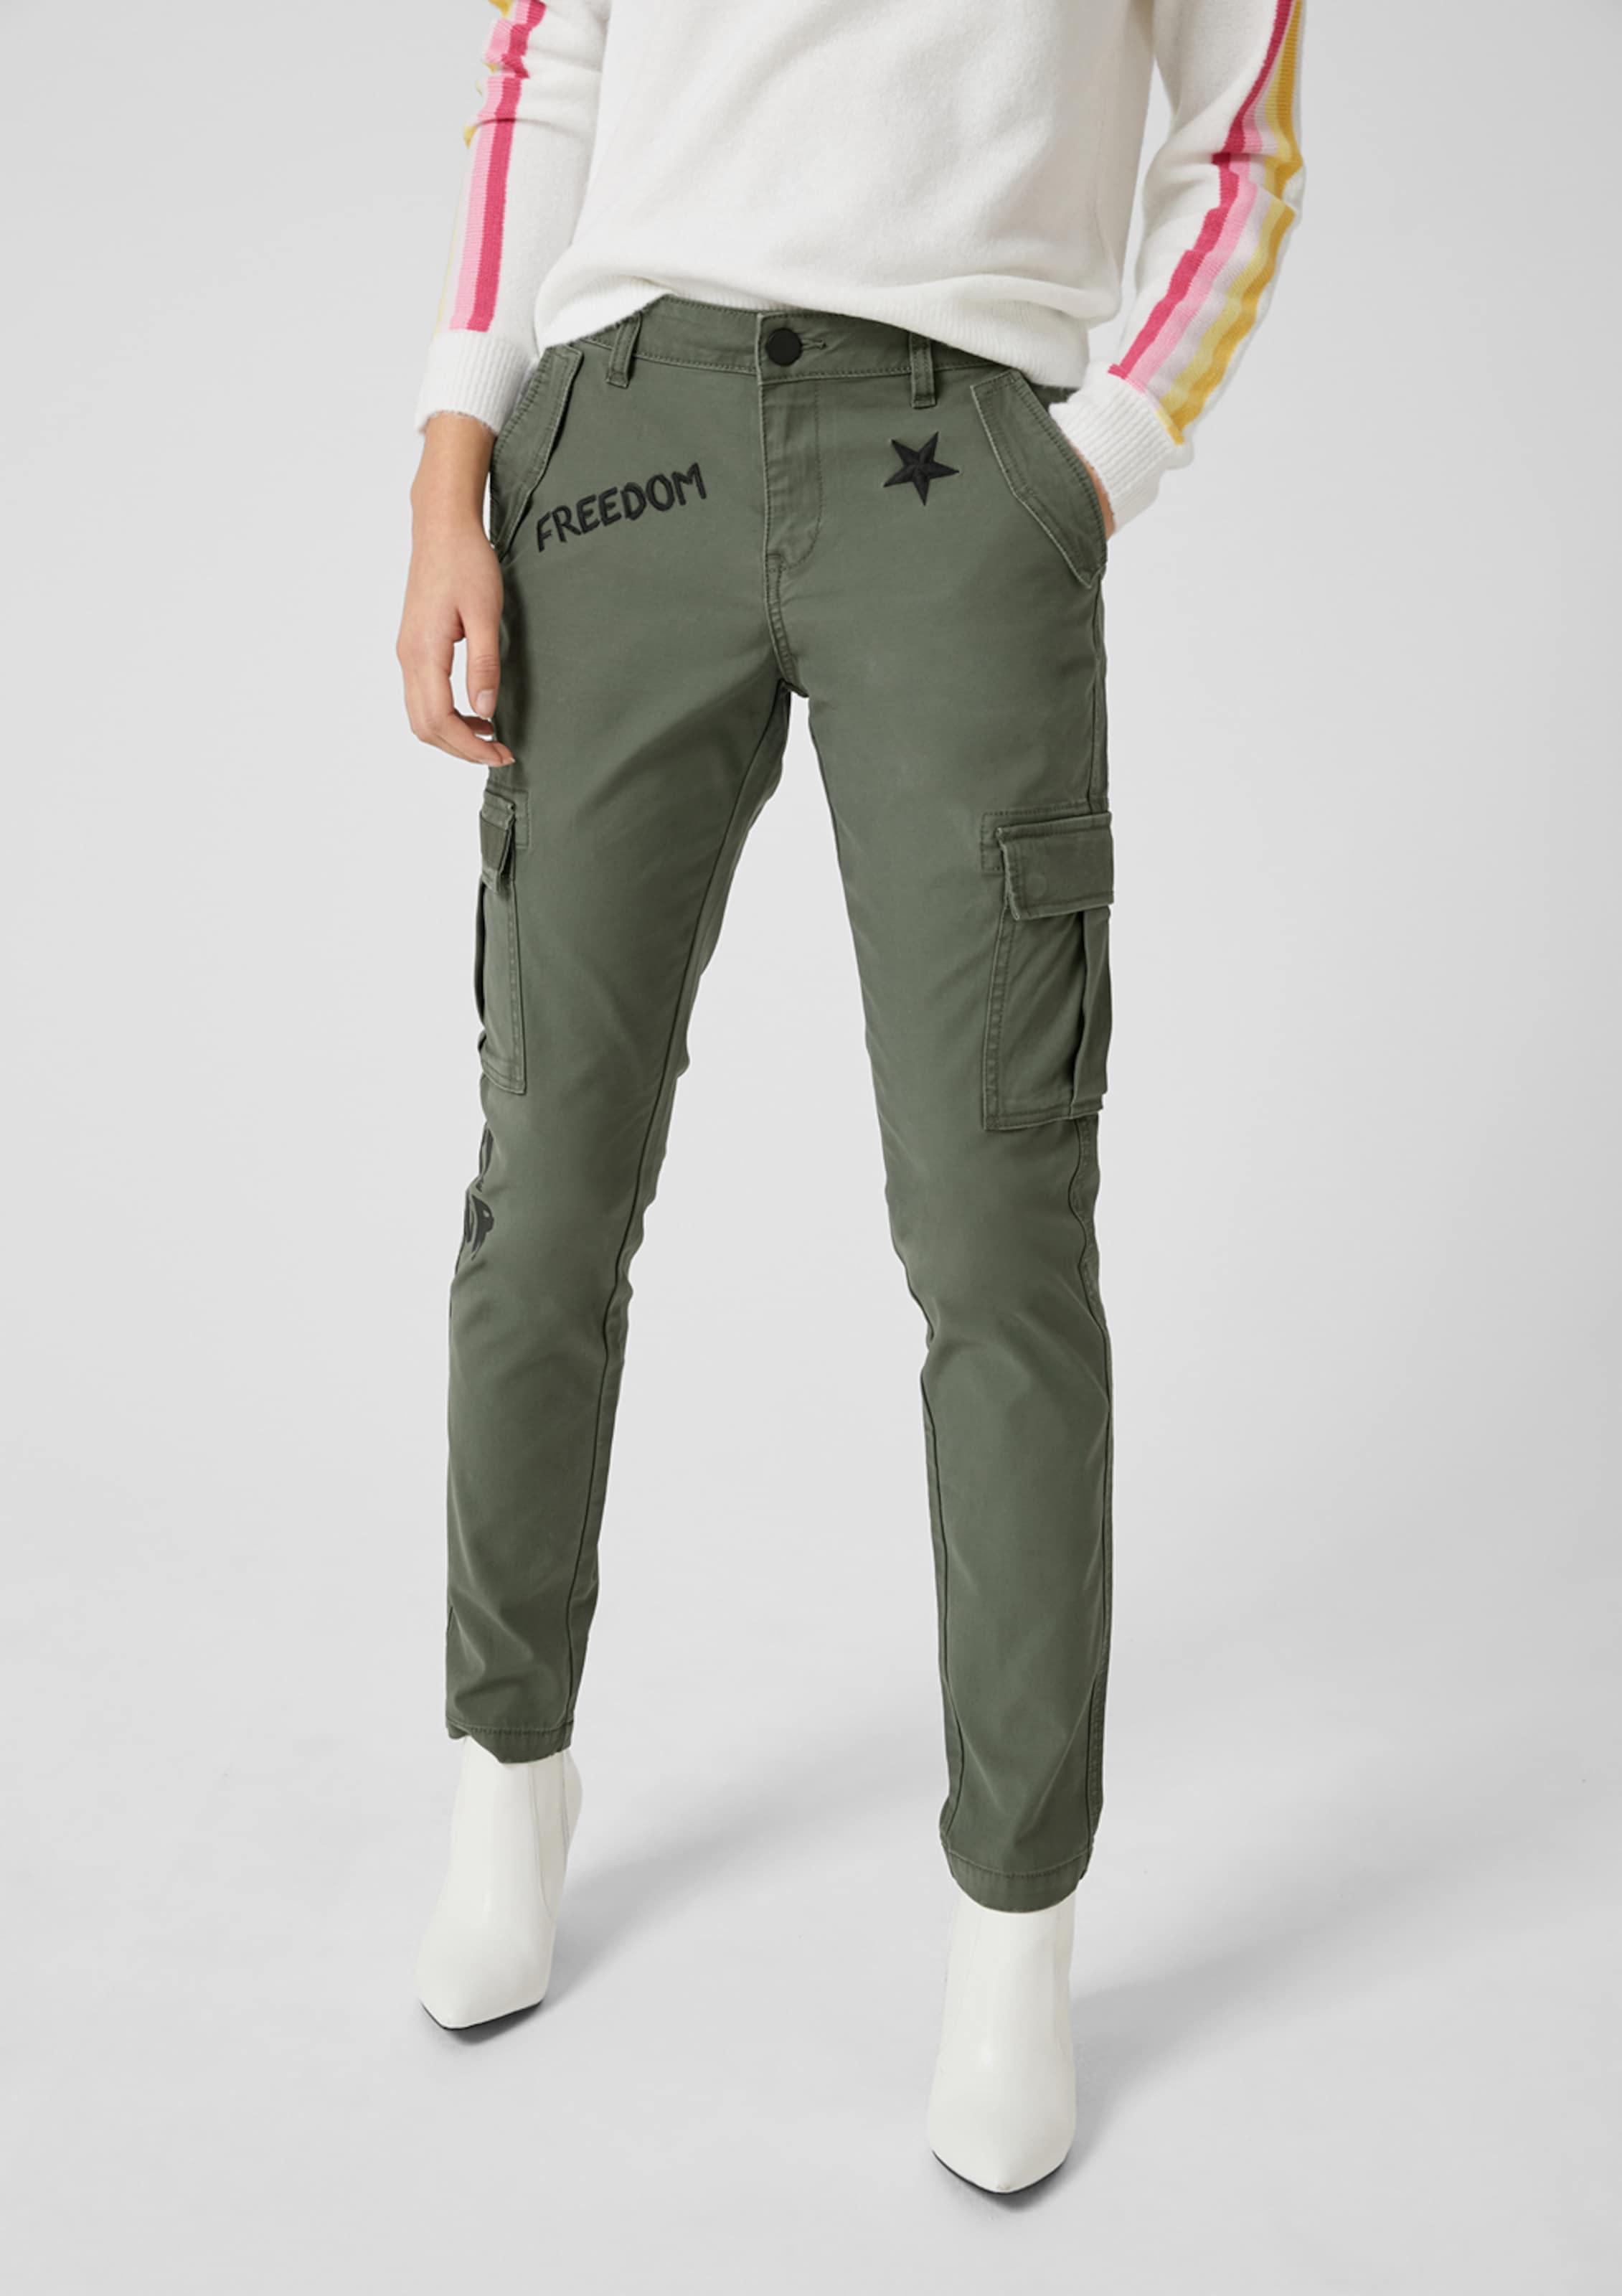 Q Cargohose Designed 'gwen' Khaki s By In m0O8nvwN